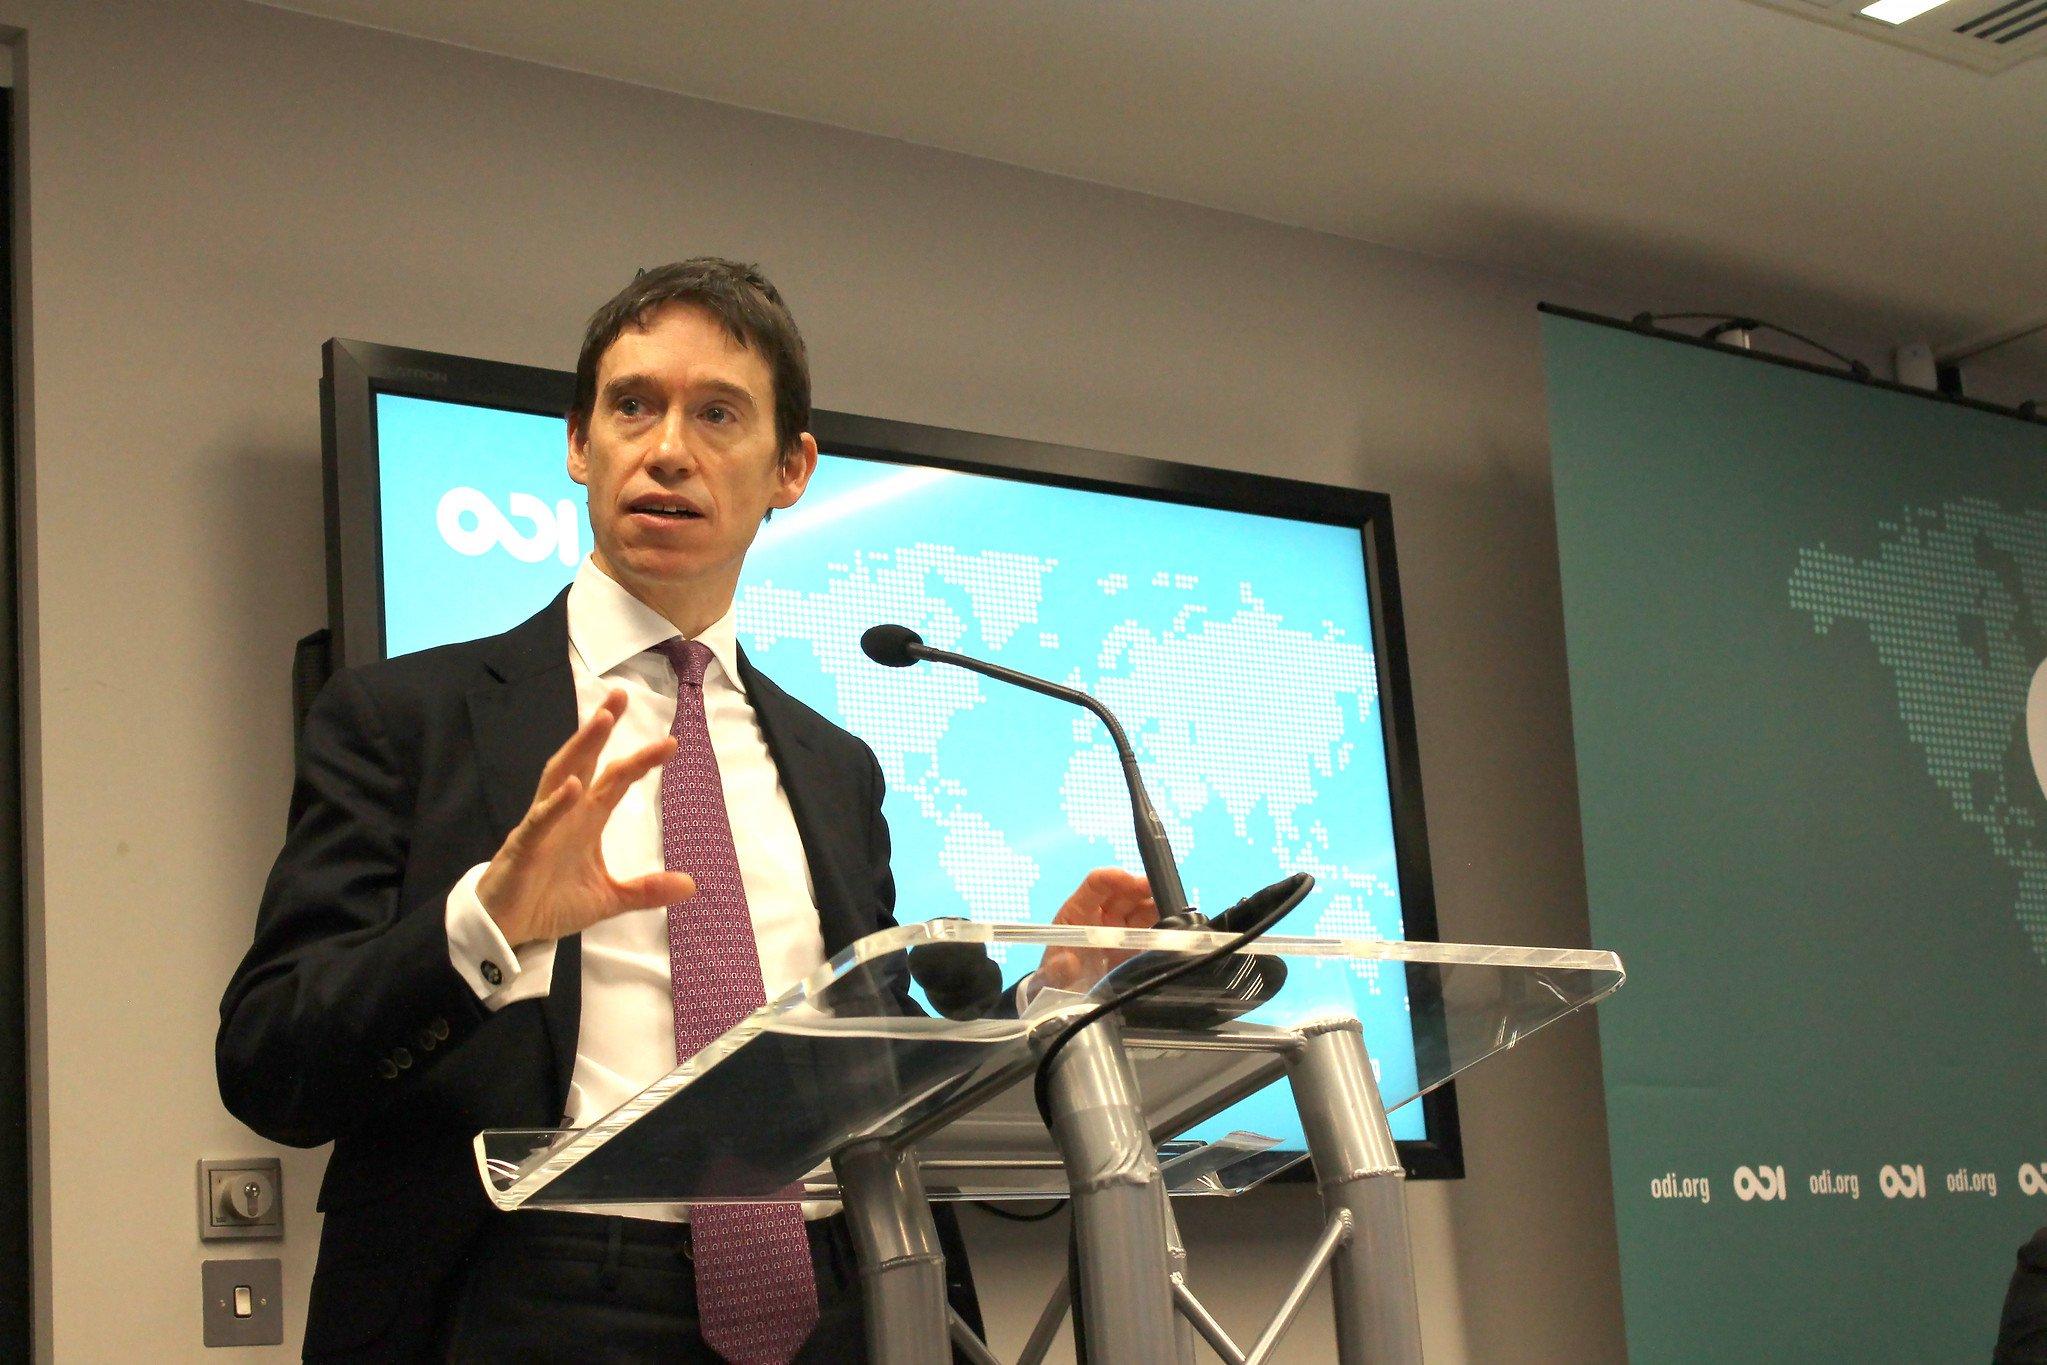 Rory Stewart delivers a keynote speech at ODI